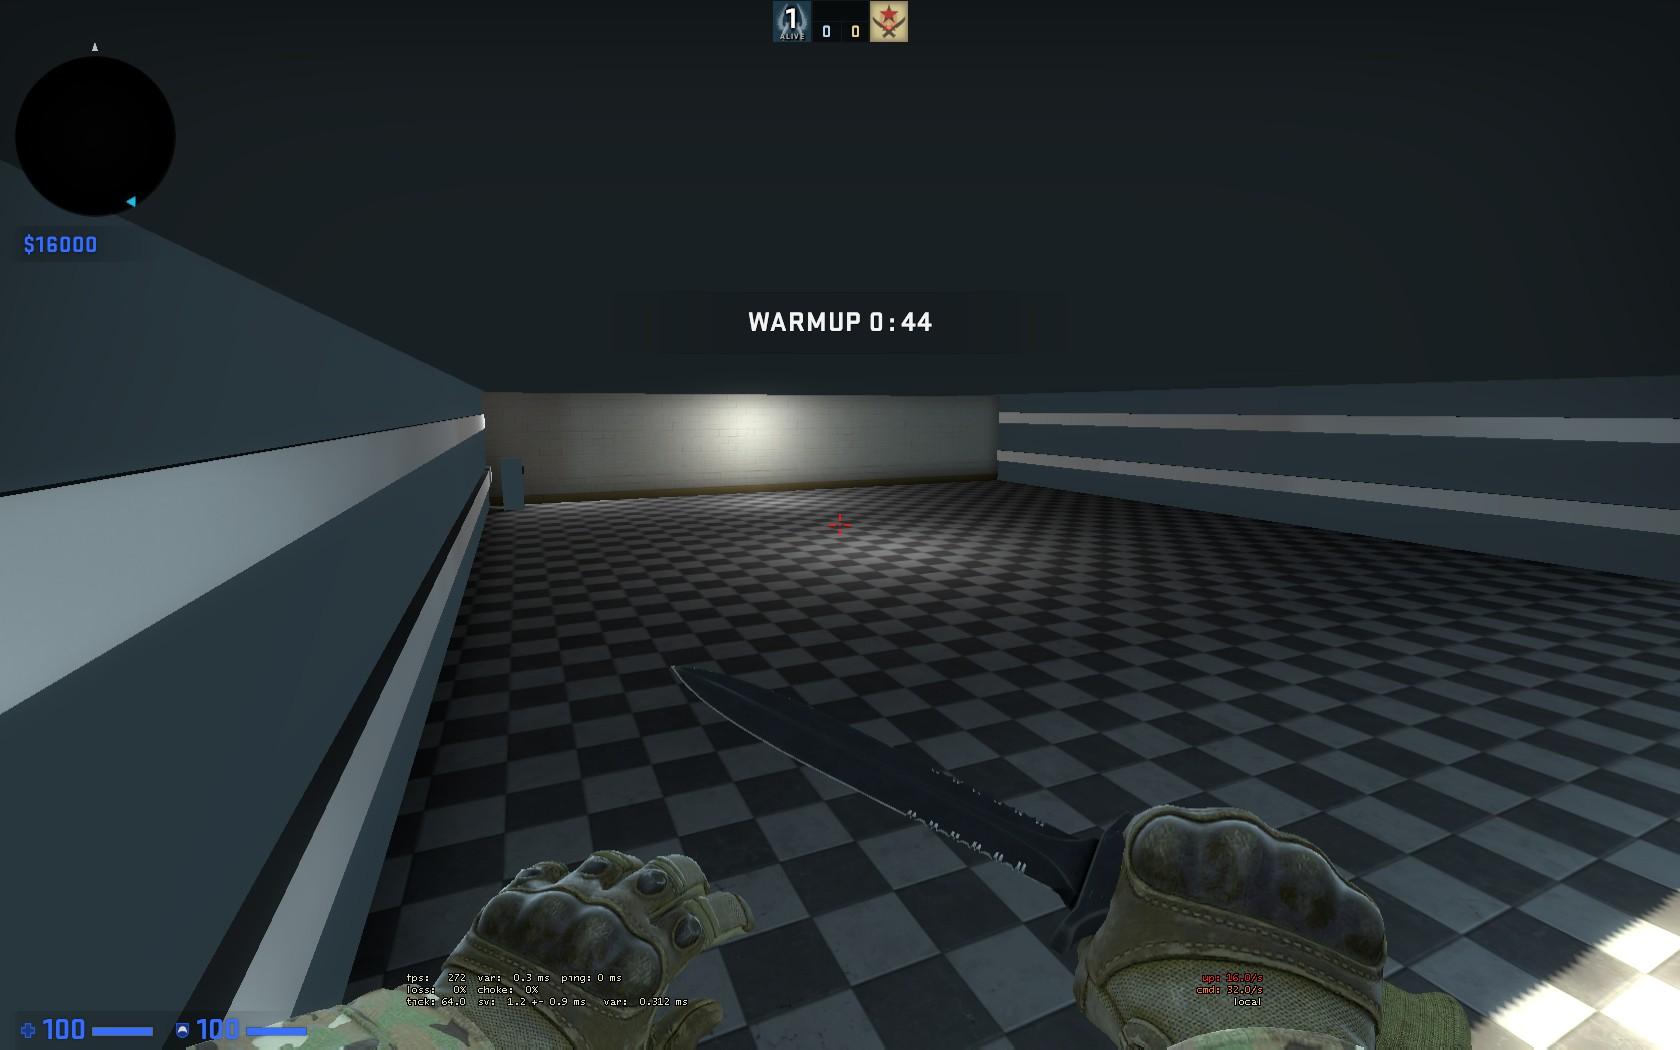 ze_light_panic_escape_b10001